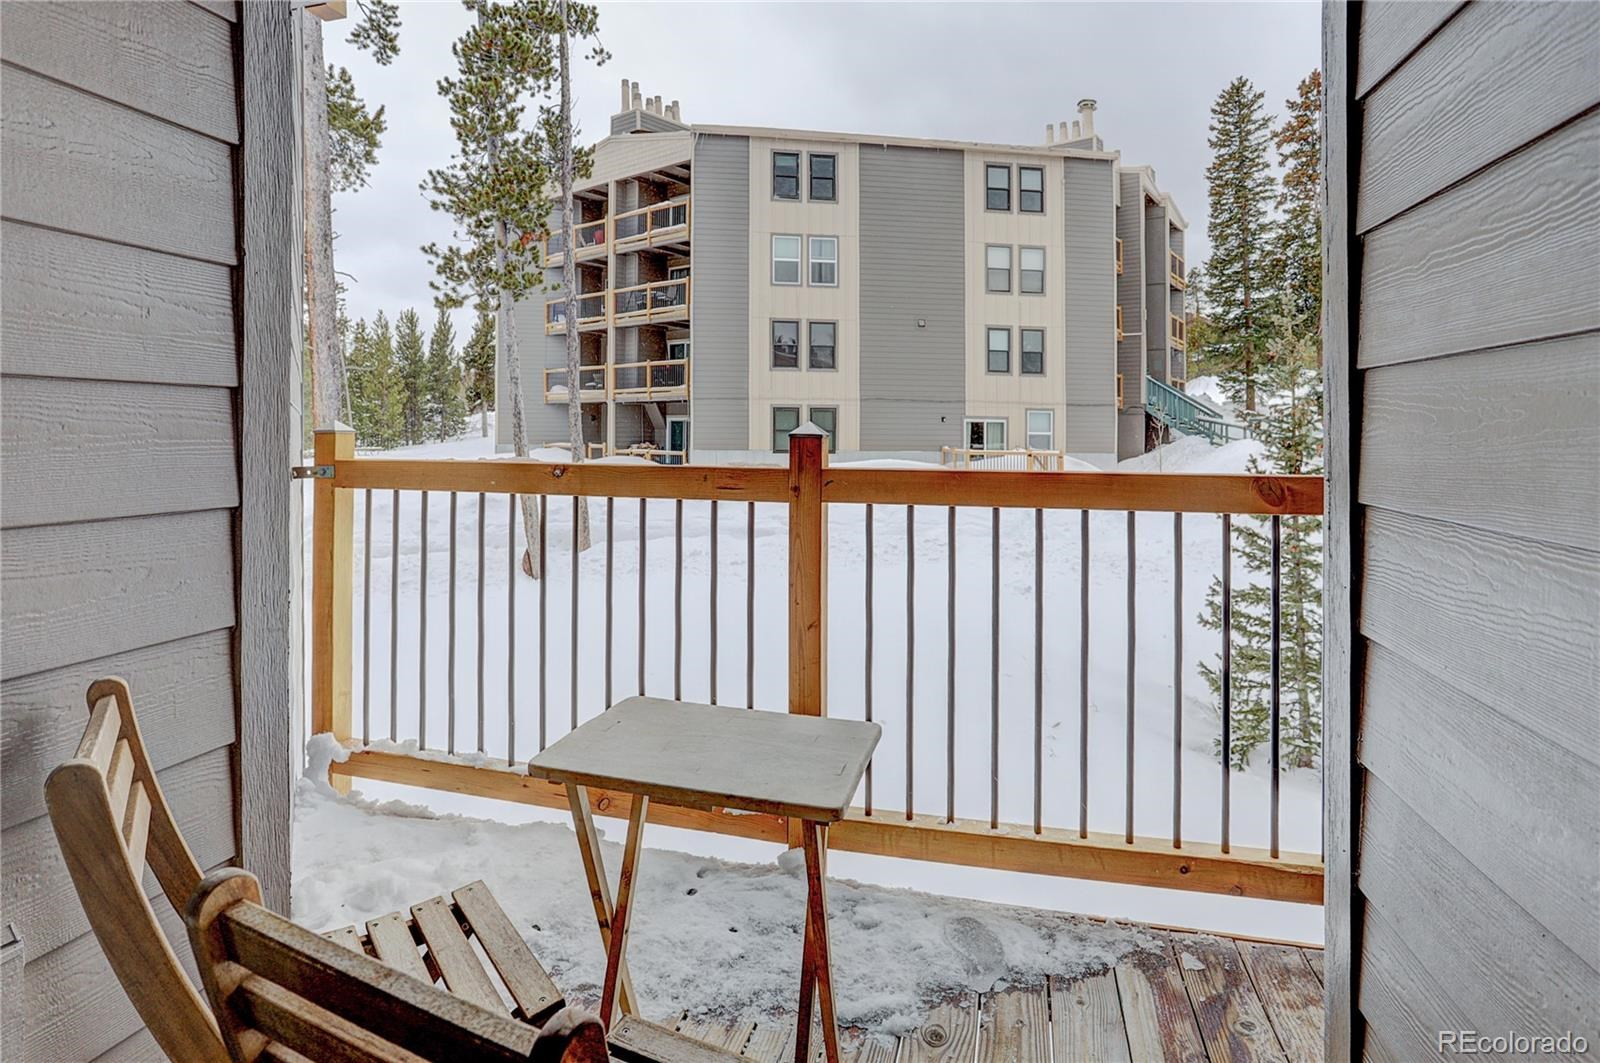 MLS# 3104503 - 19 - 2400 Lodge Pole Circle #206, Silverthorne, CO 80498